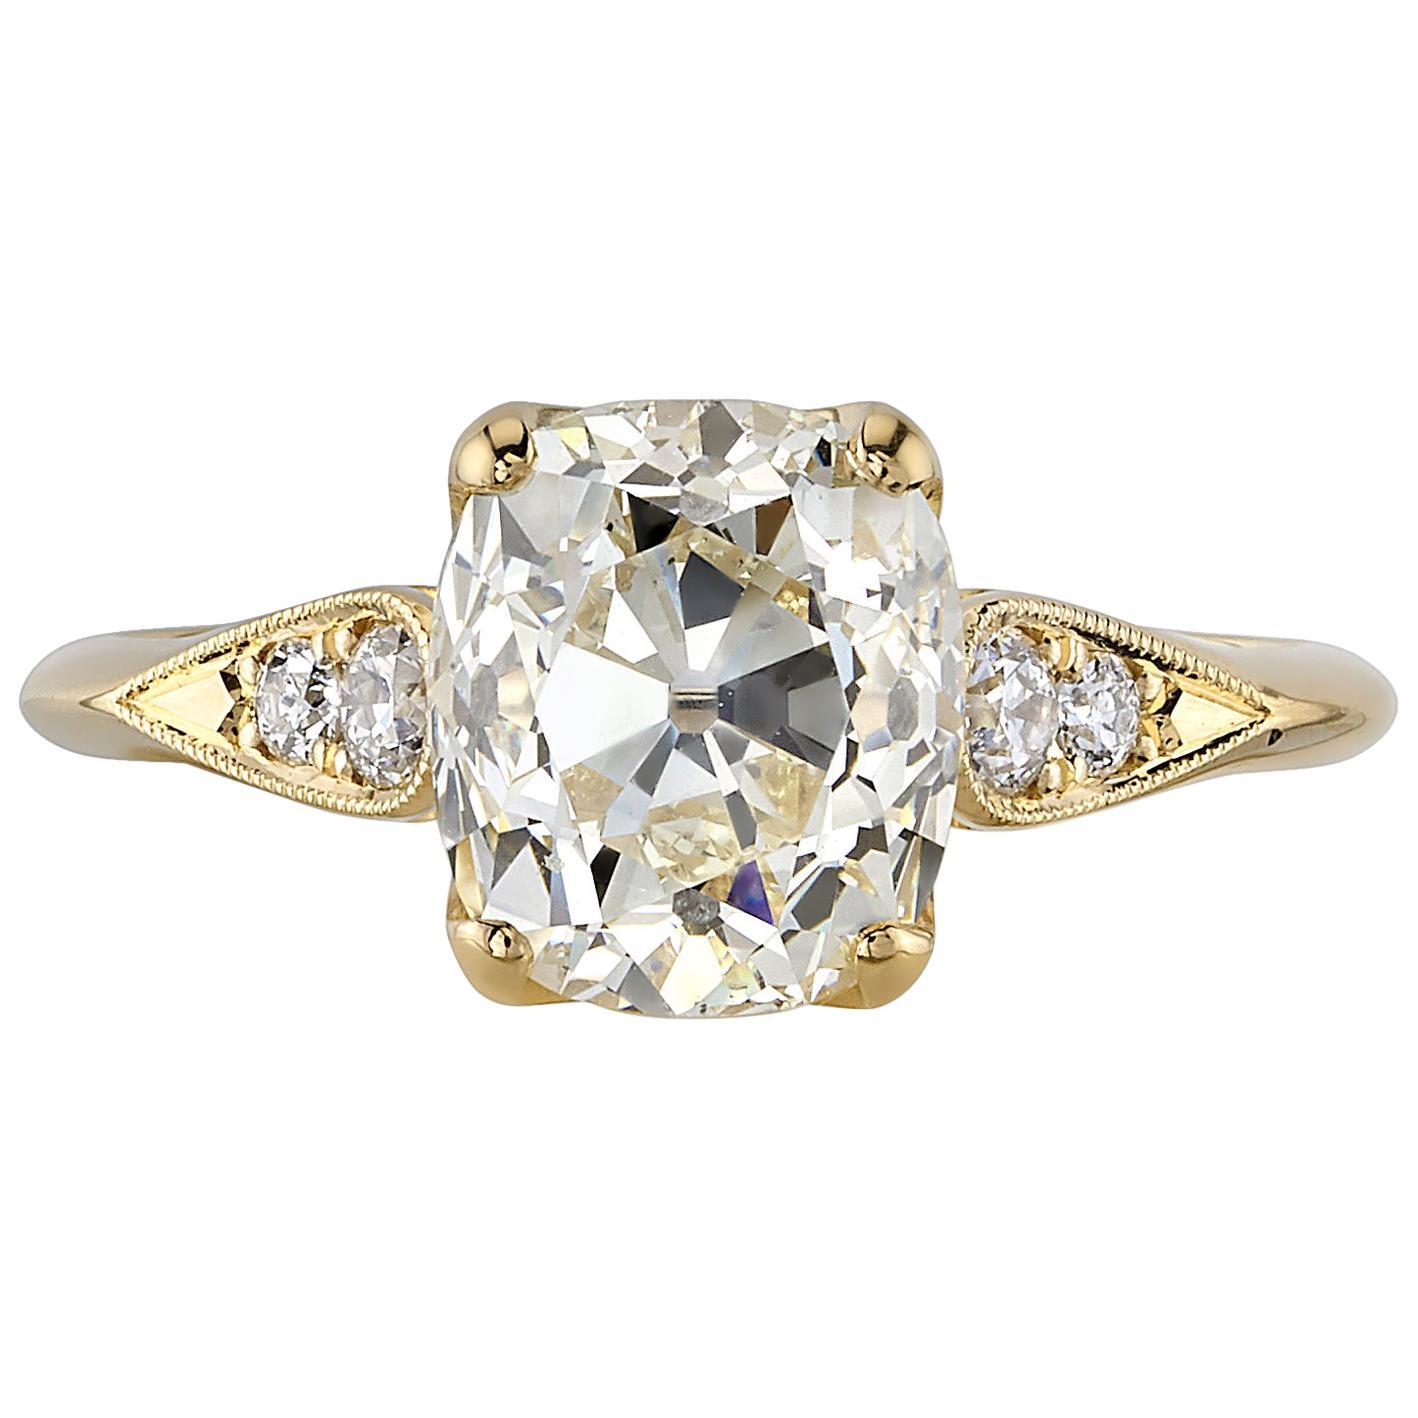 Handcrafted Amanda Cushion Cut Diamond Ring by Single Stone